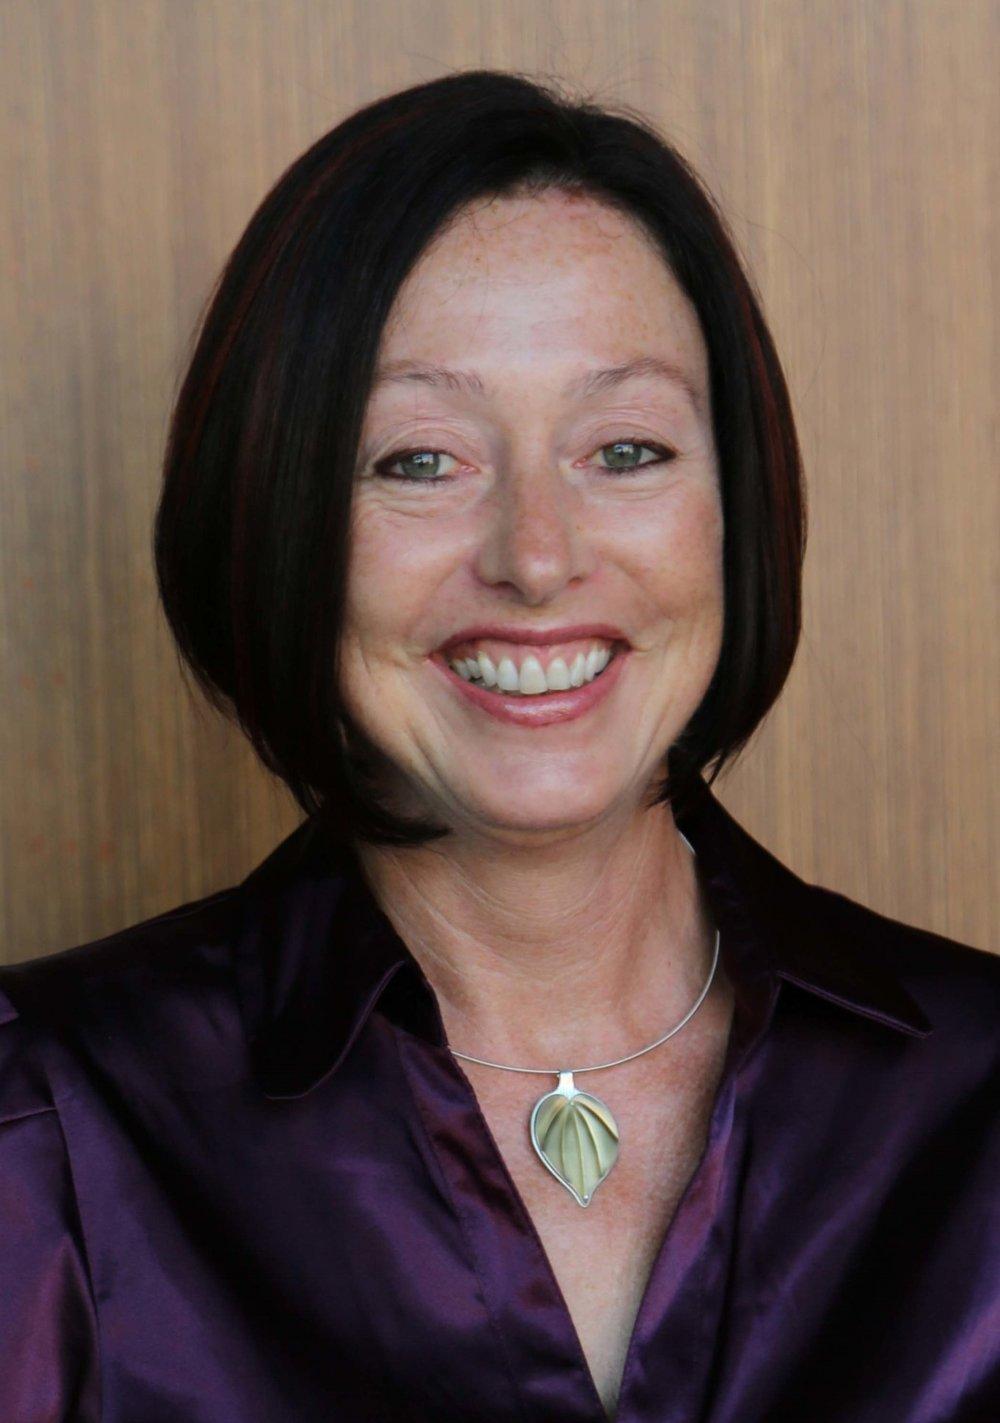 Personal Branding Client Alyson Keller